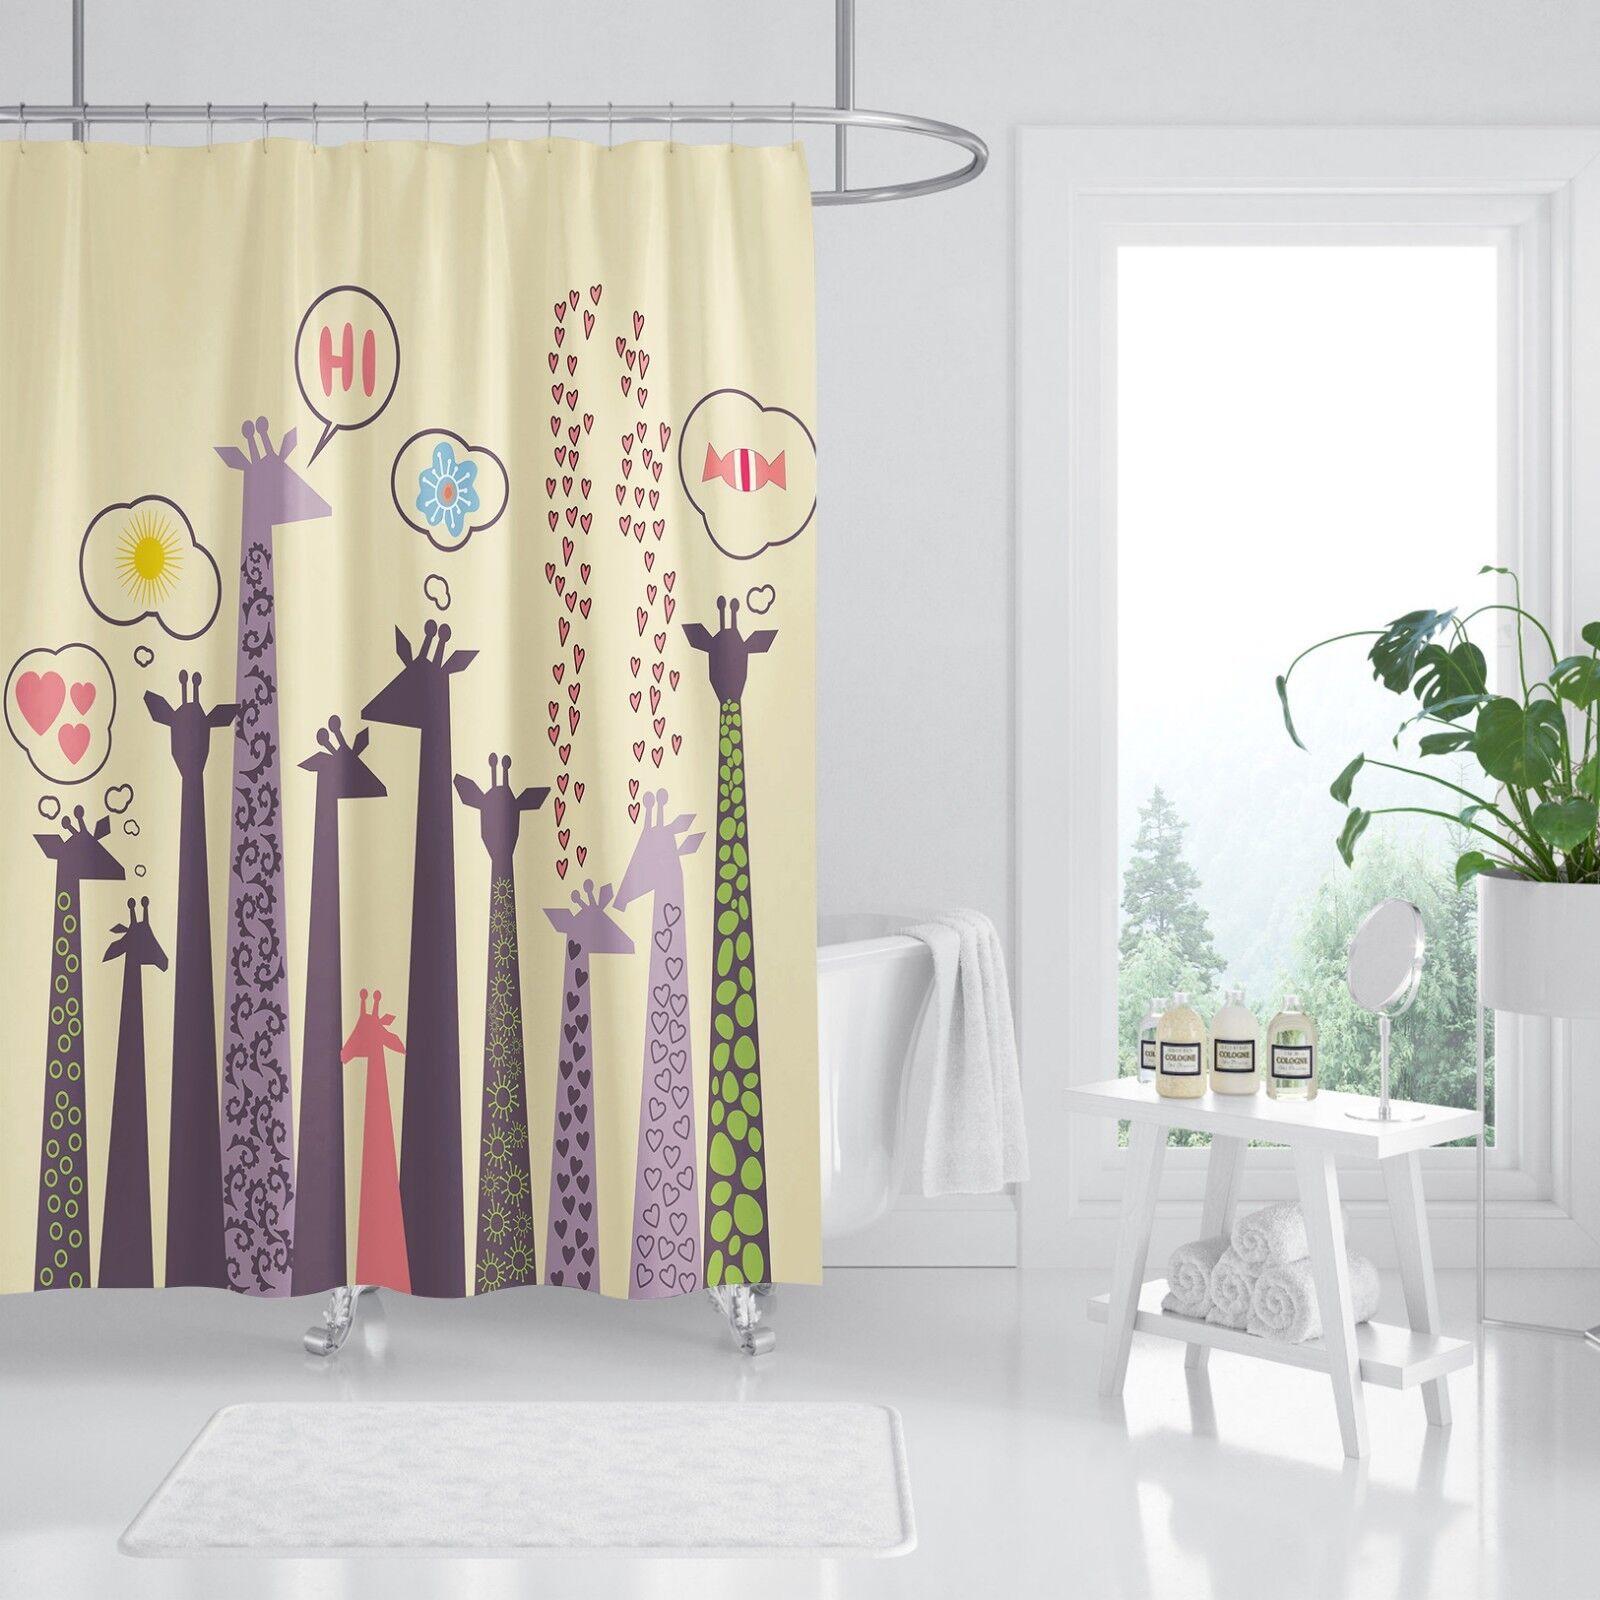 3D Girafe Animal 4 Rideau de Douche Imperméable Fibre Salle de Bain Home Windows Toilette